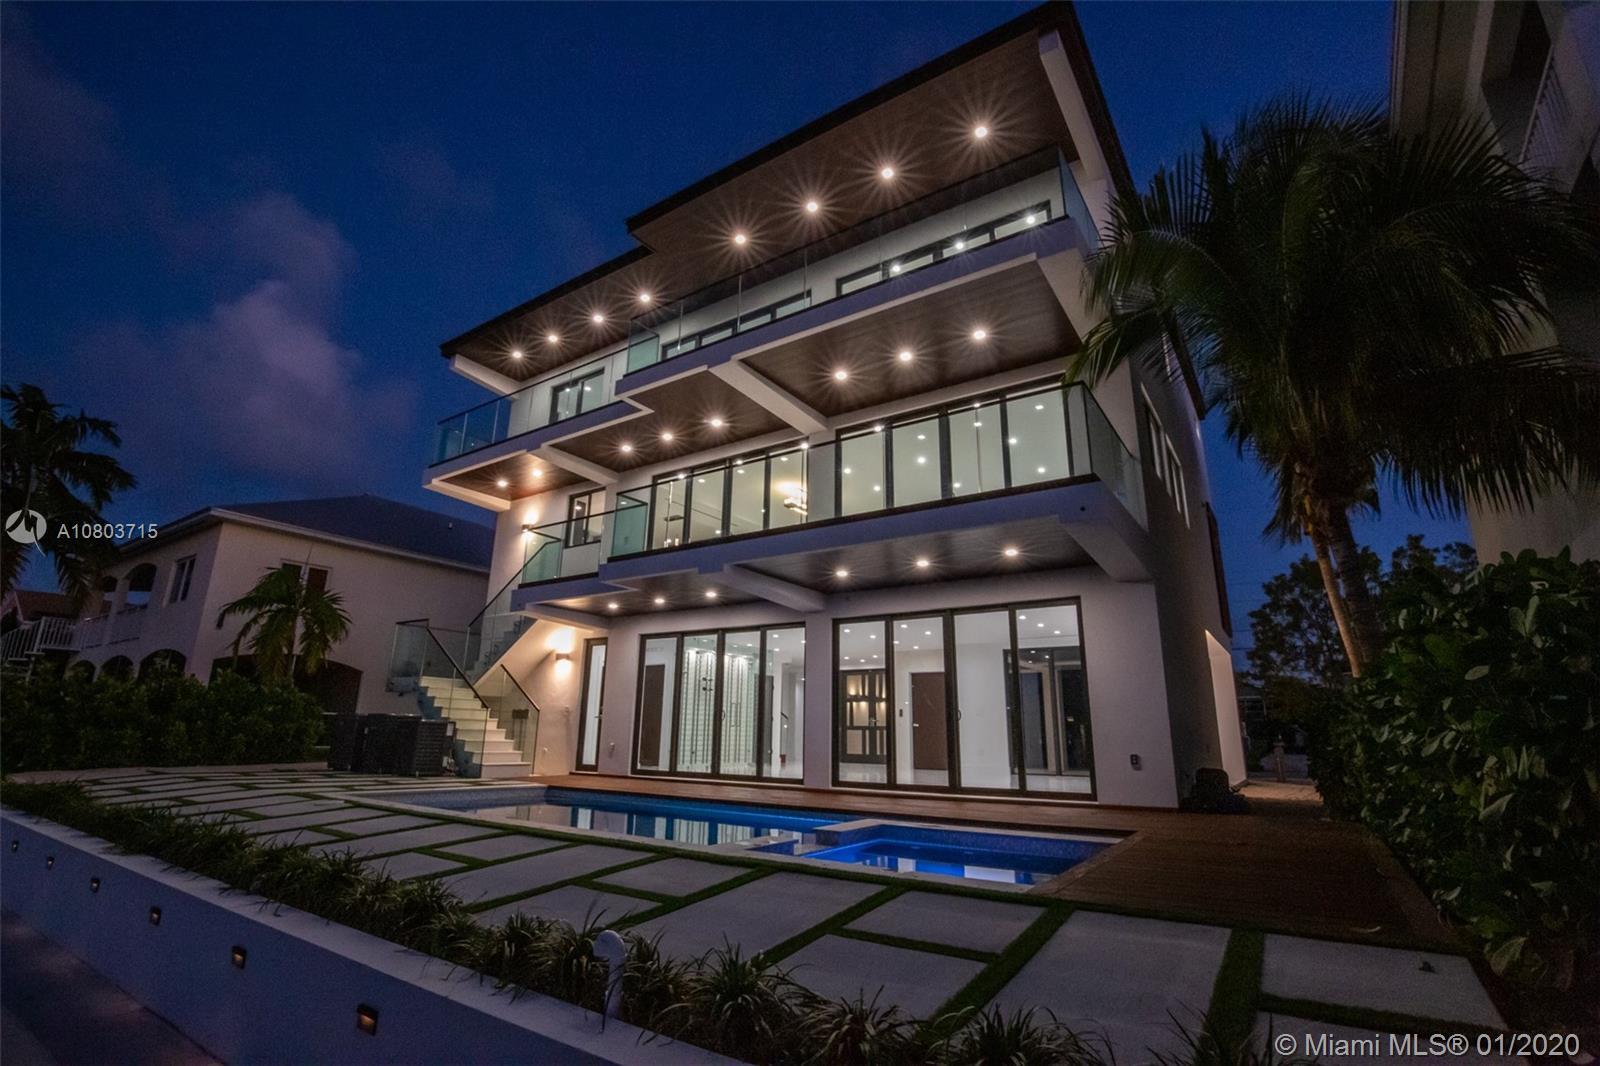 118 Madeira Ct, Islamorada, FL 33036 - Islamorada, FL real estate listing